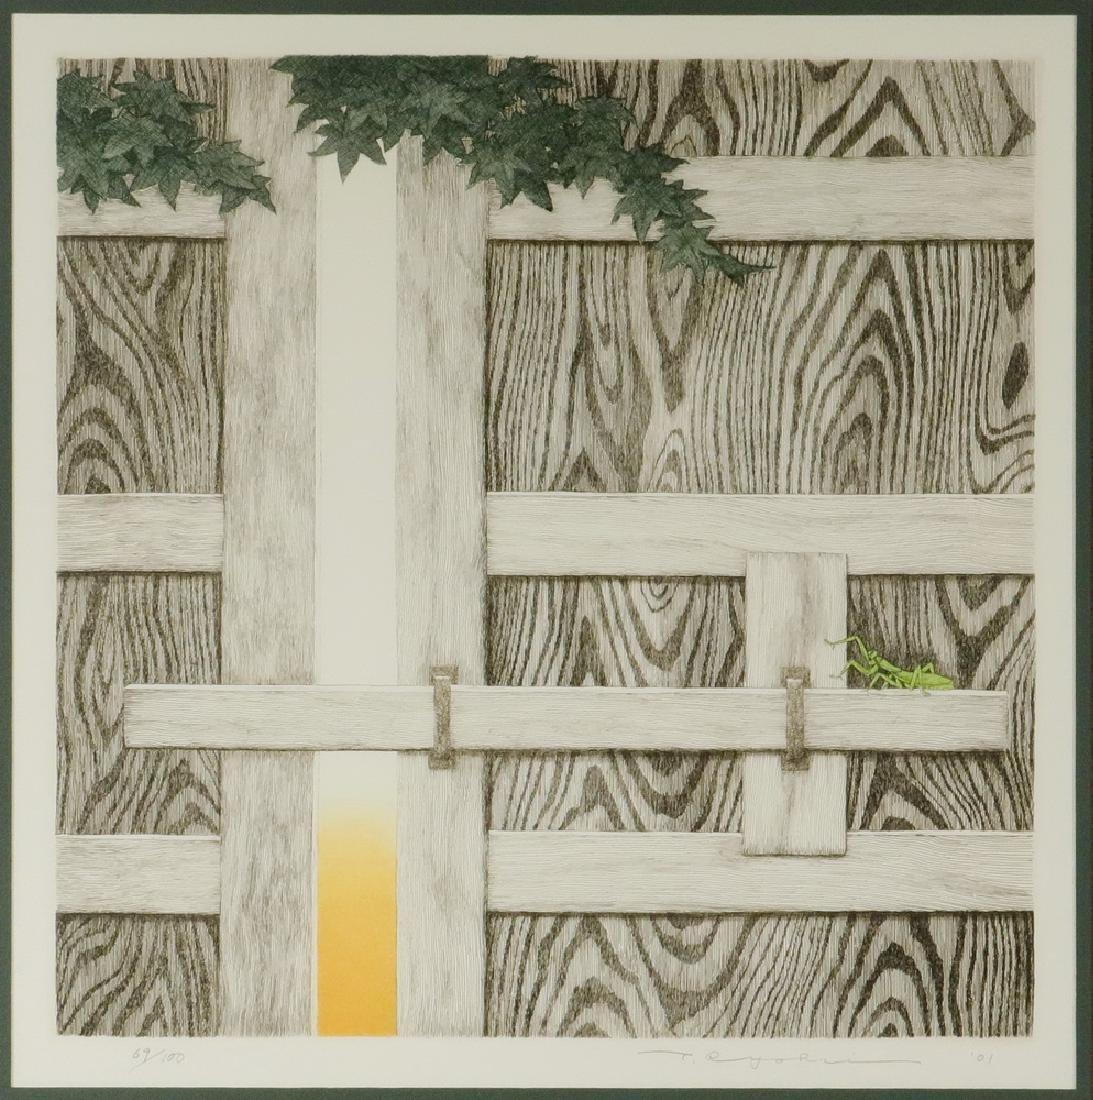 RYOHEI TANAKA (JAPAN, 1933 - ) - 2